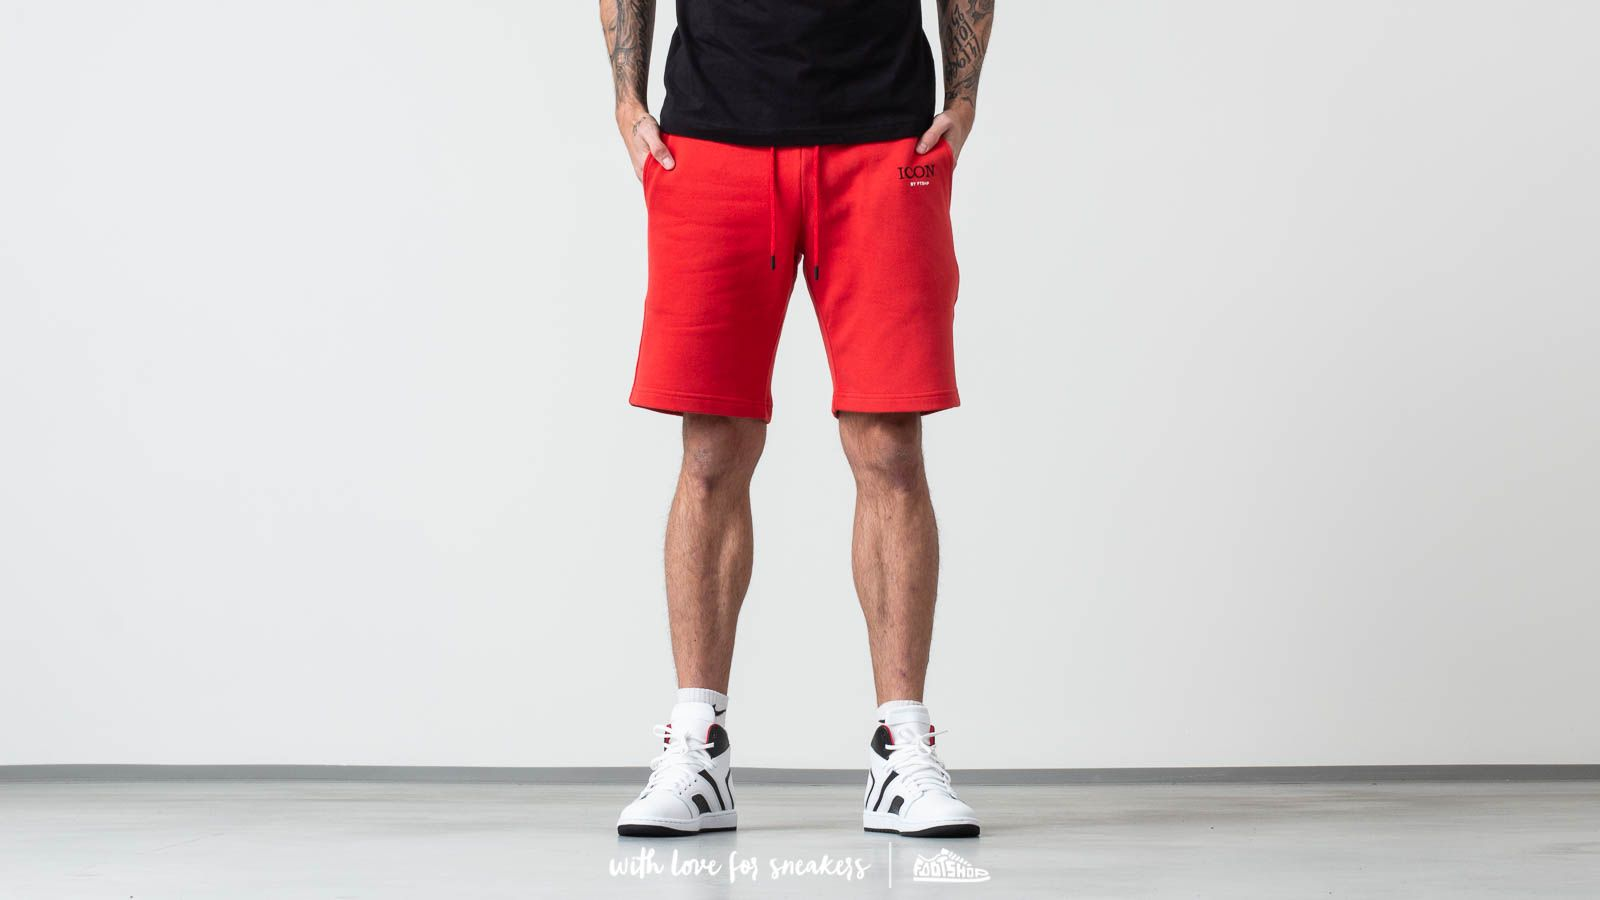 FTSHP x Rytmus Shorts Red za skvelú cenu 51 € kúpite na Footshop.sk